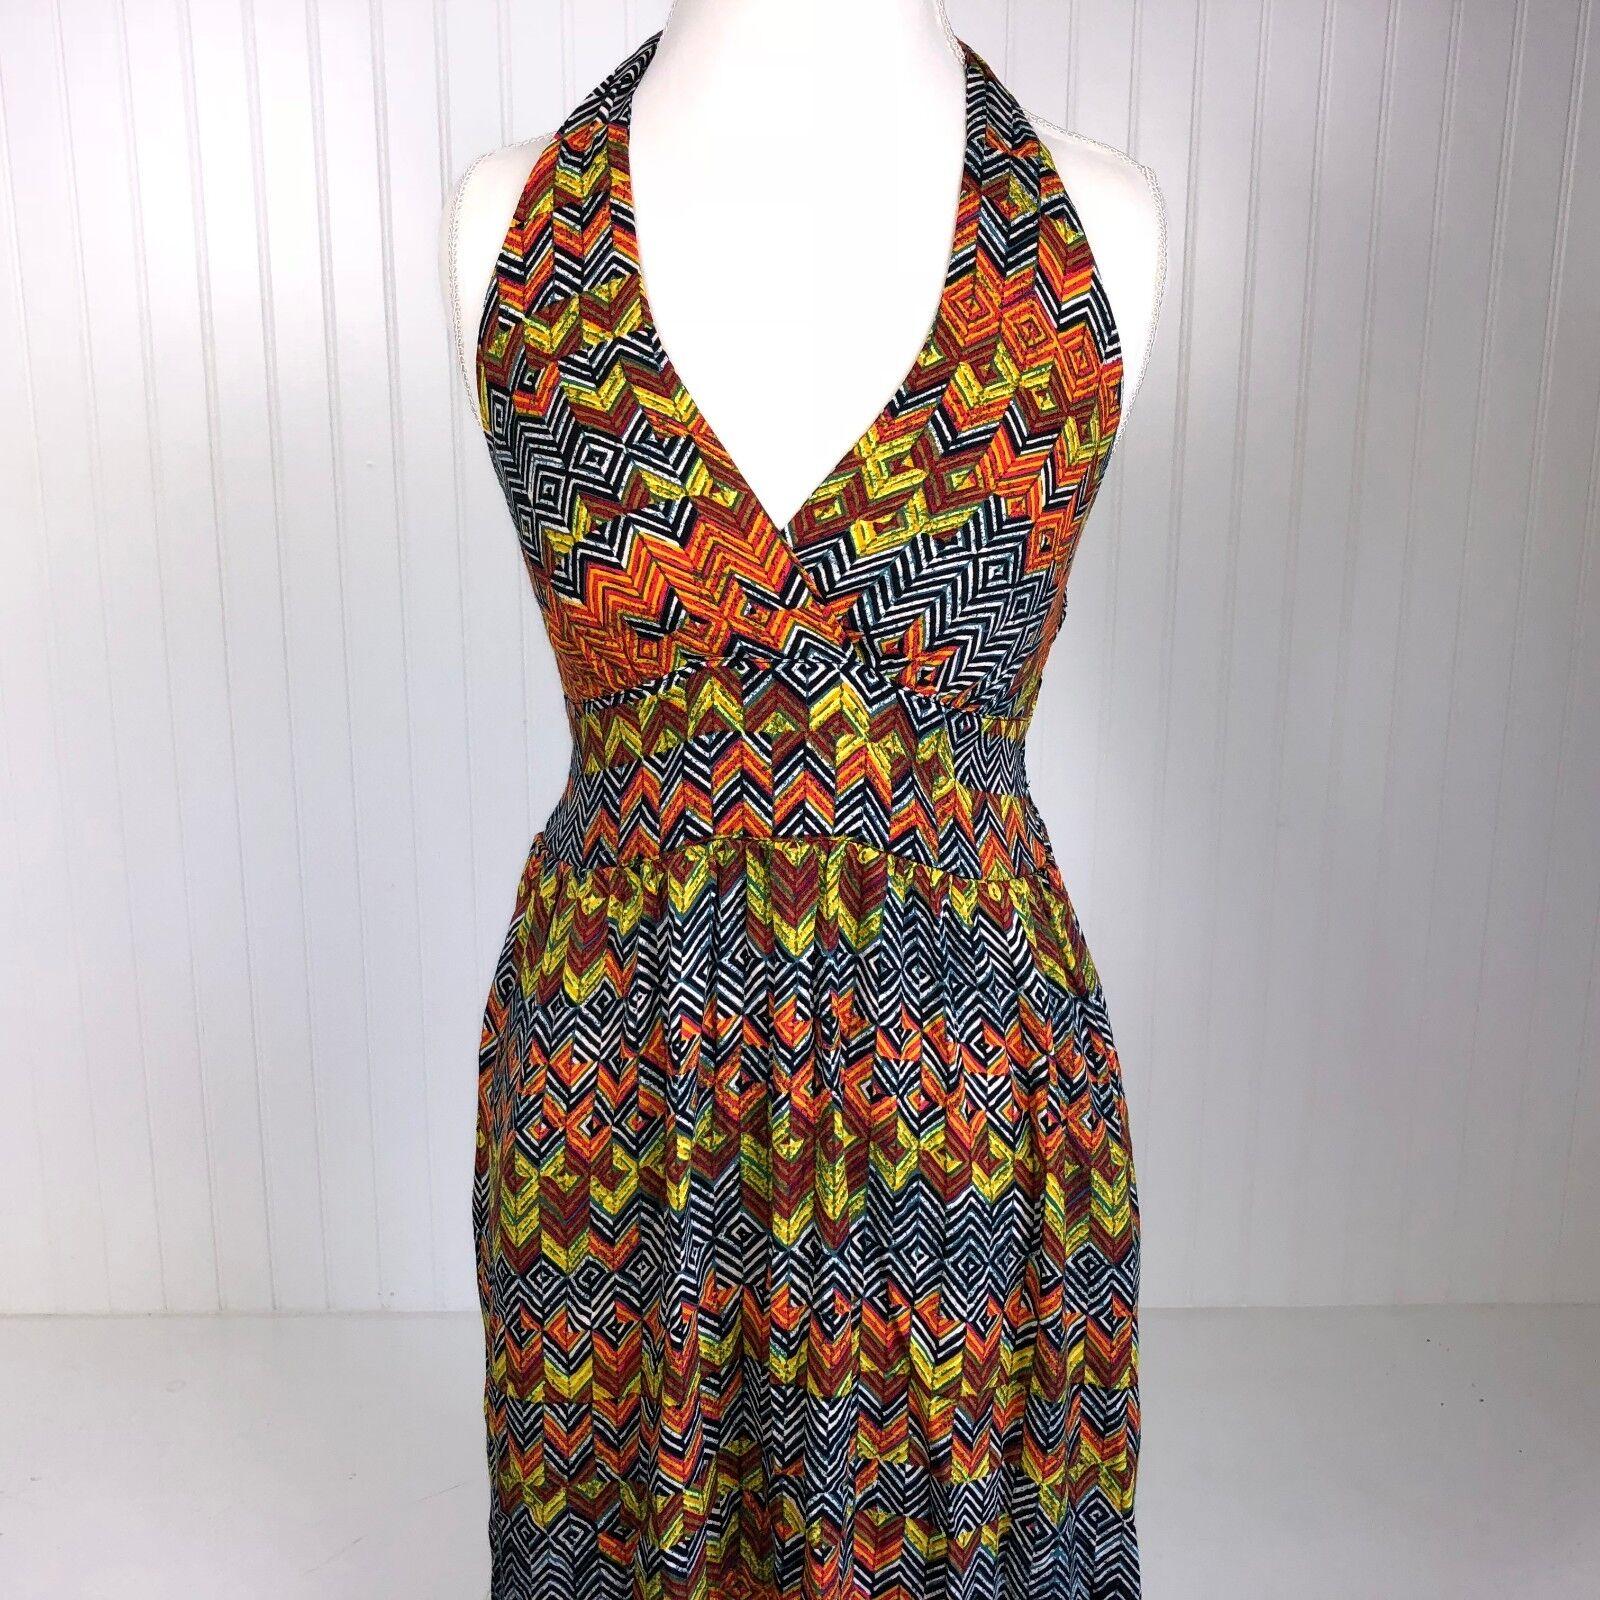 NWT Anthropologie Ella Moss Boho Chevron Maxi Dress S Boho B70